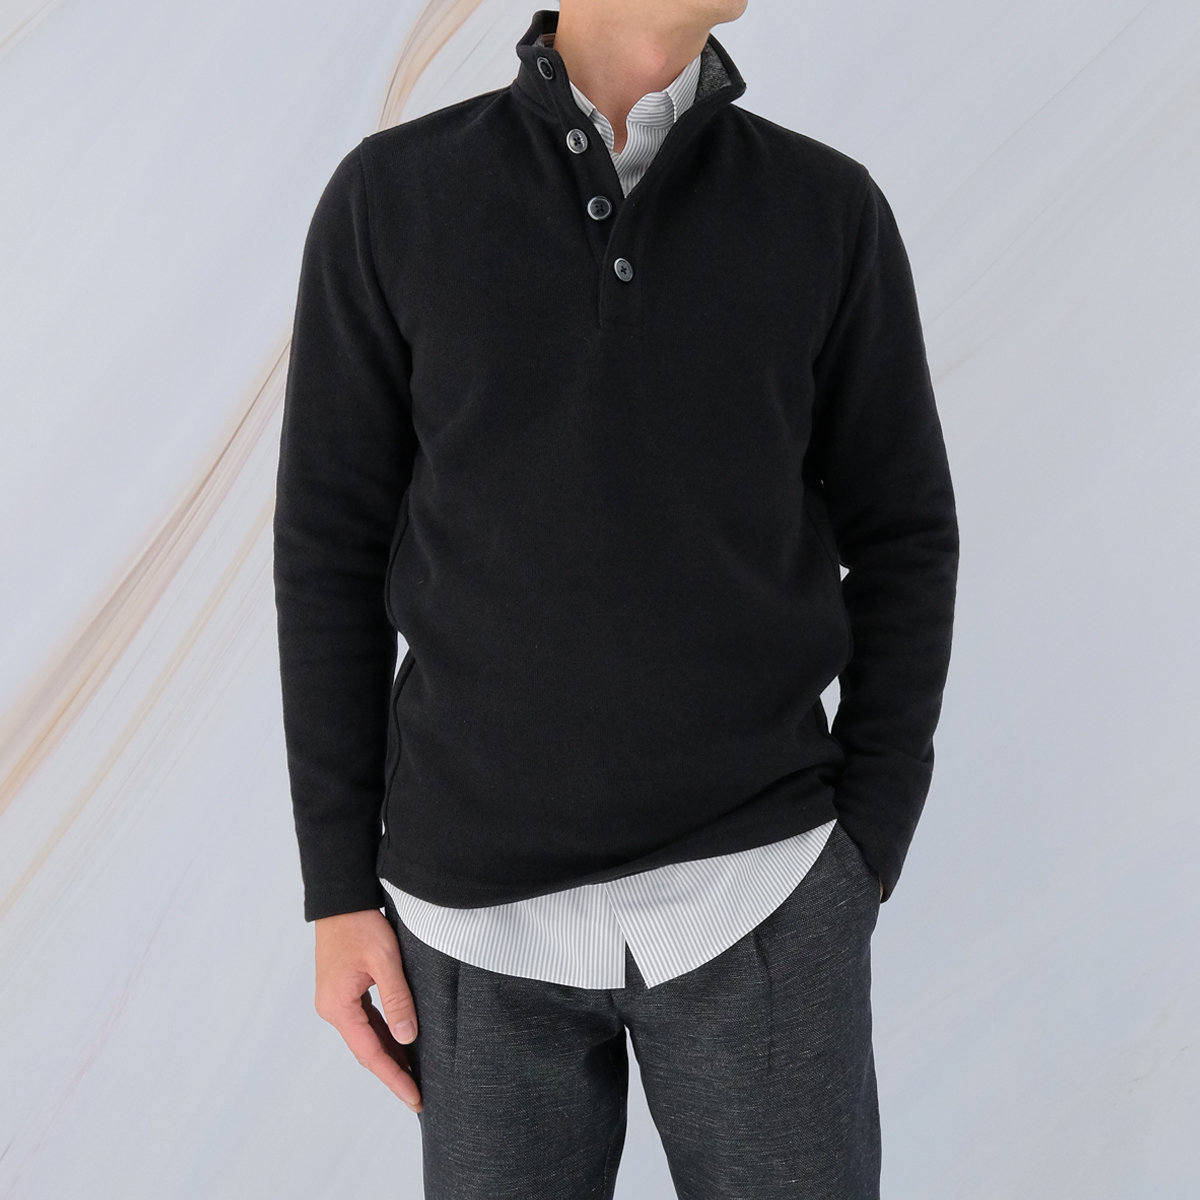 Men's Cotton French Rib Long Sleeve Tee (Black)